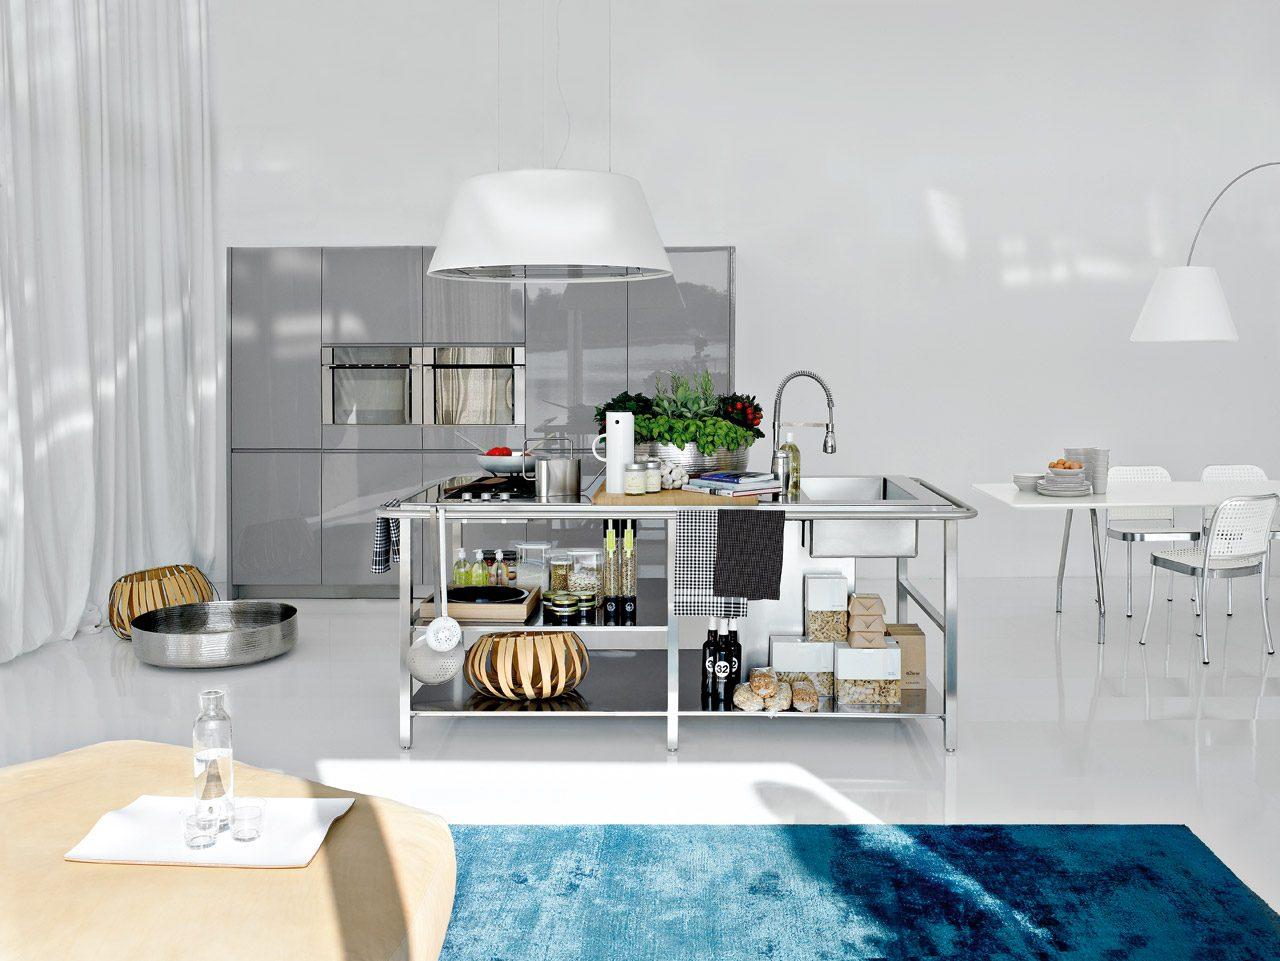 Colores para una cocina moderna de acero inoxidable - Cenefas modernas para cocina ...